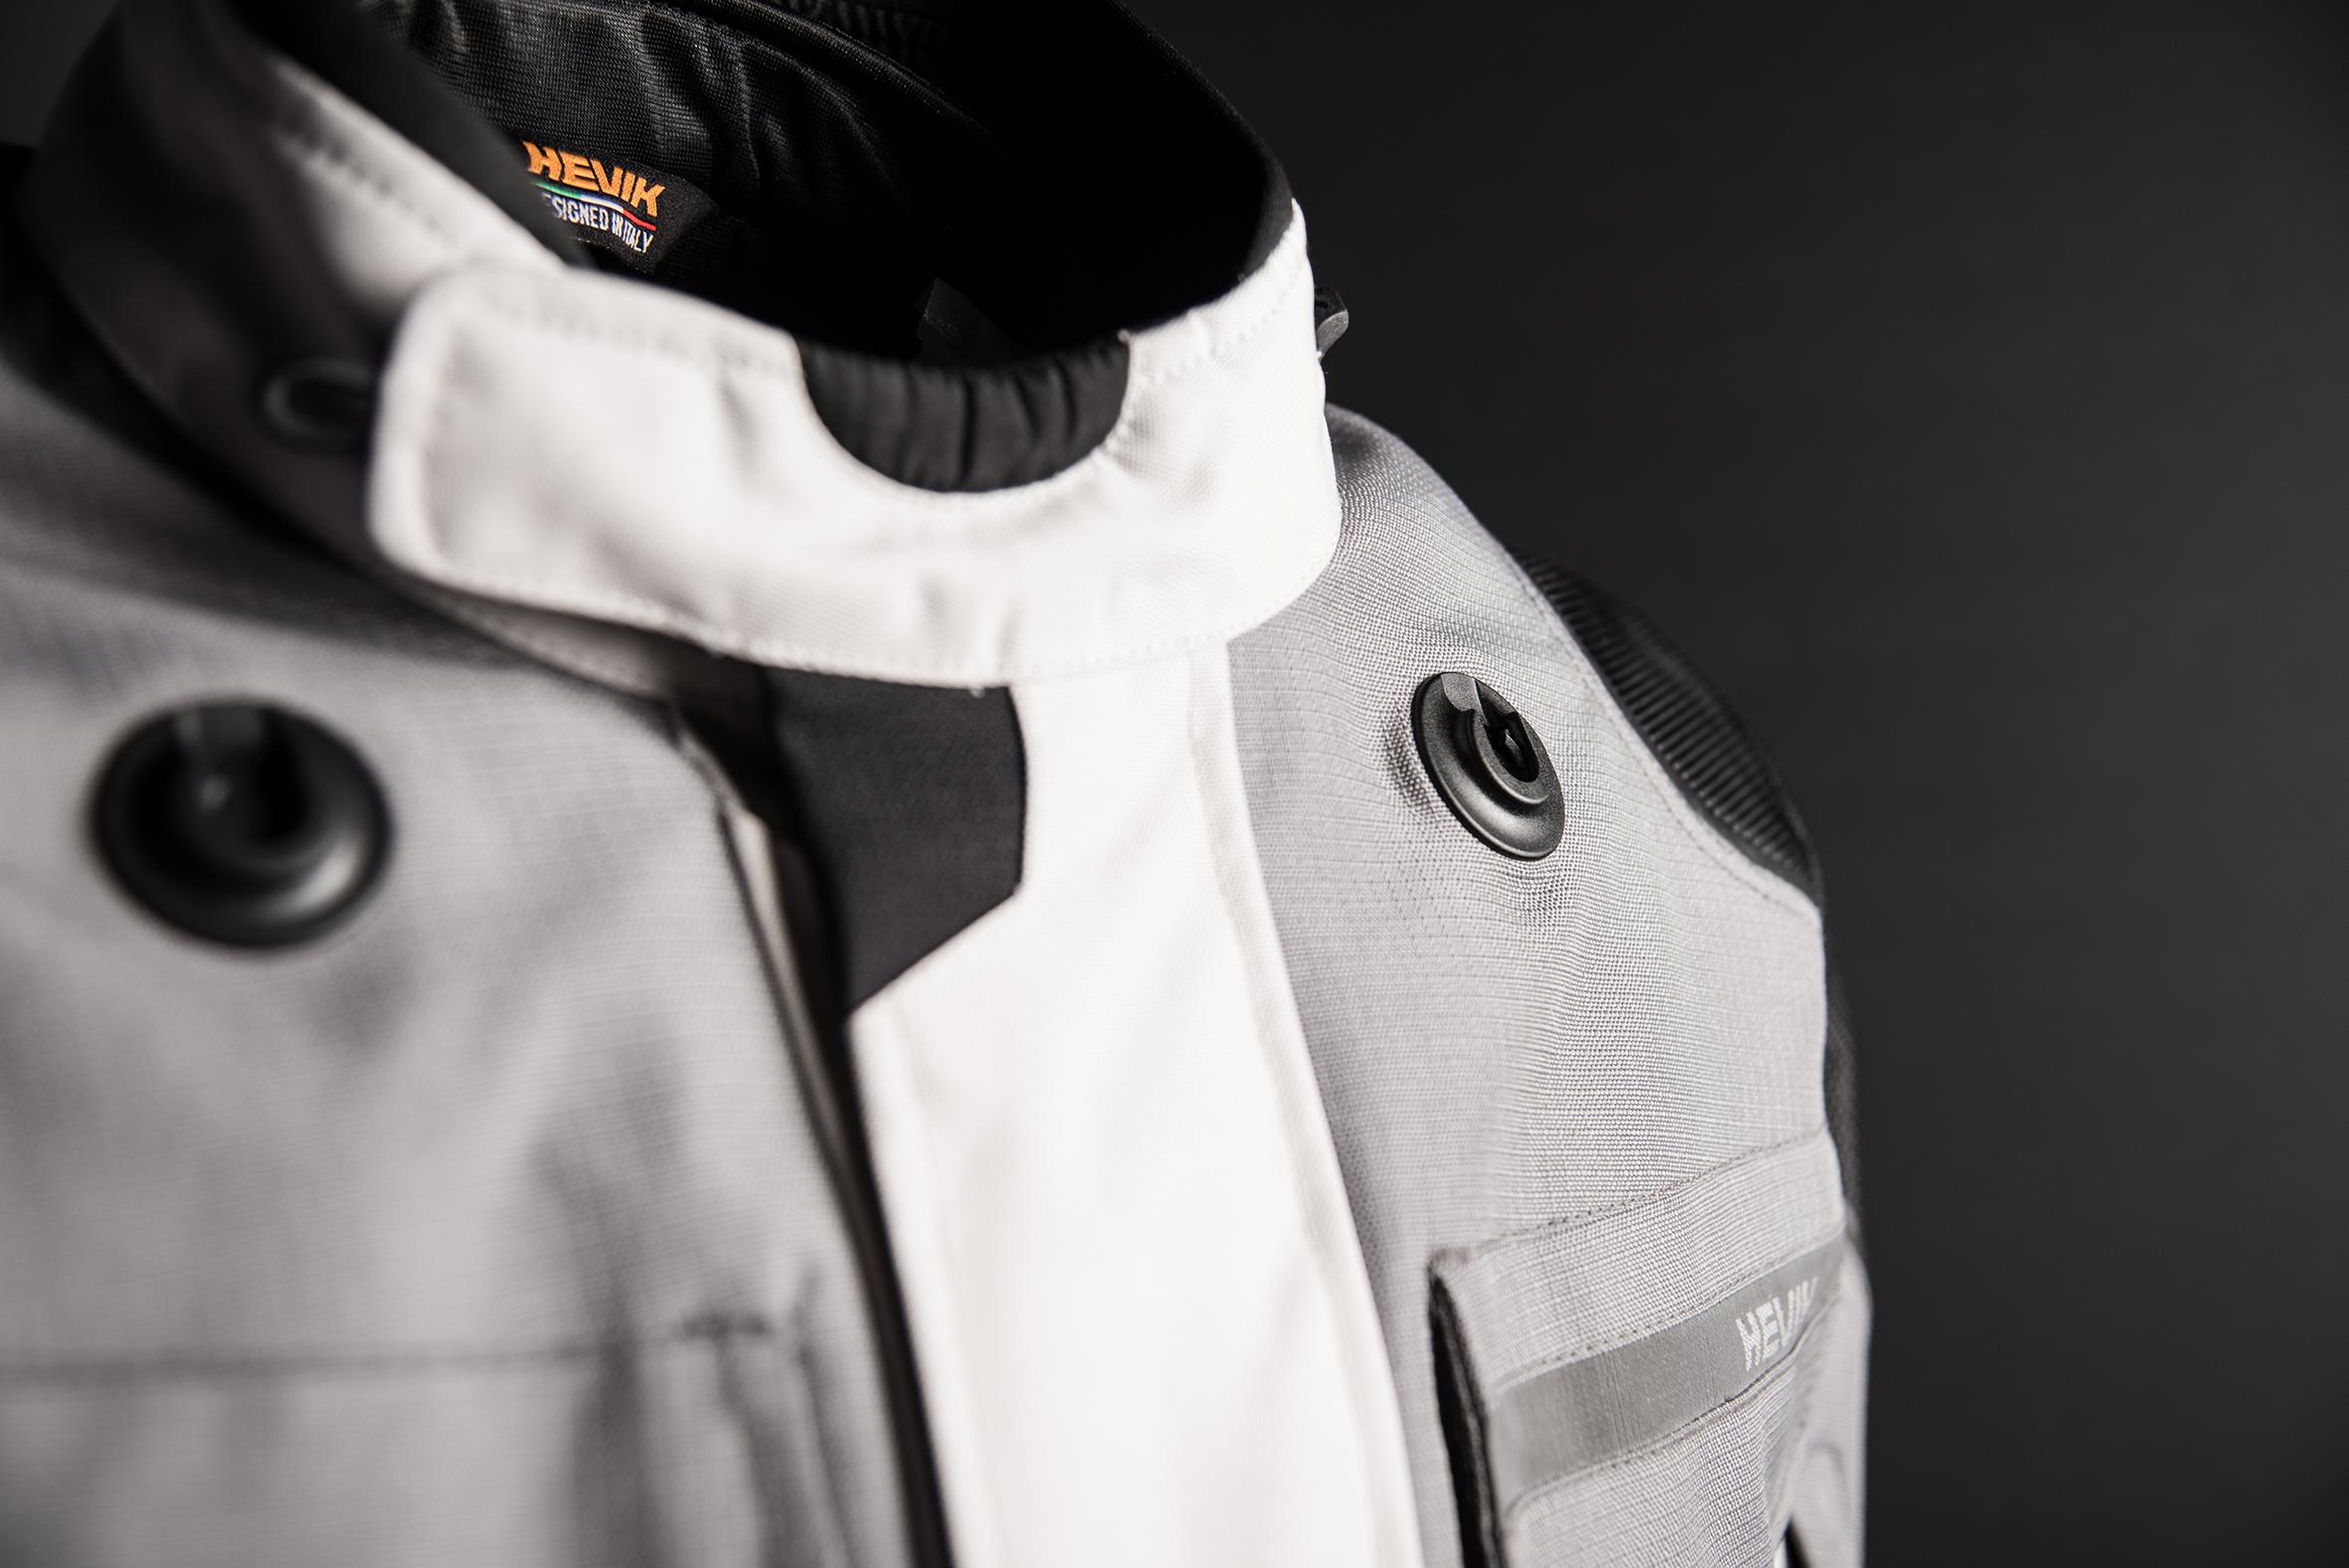 Chaqueta para moto Titanium de Hevik blanco-gris-negro